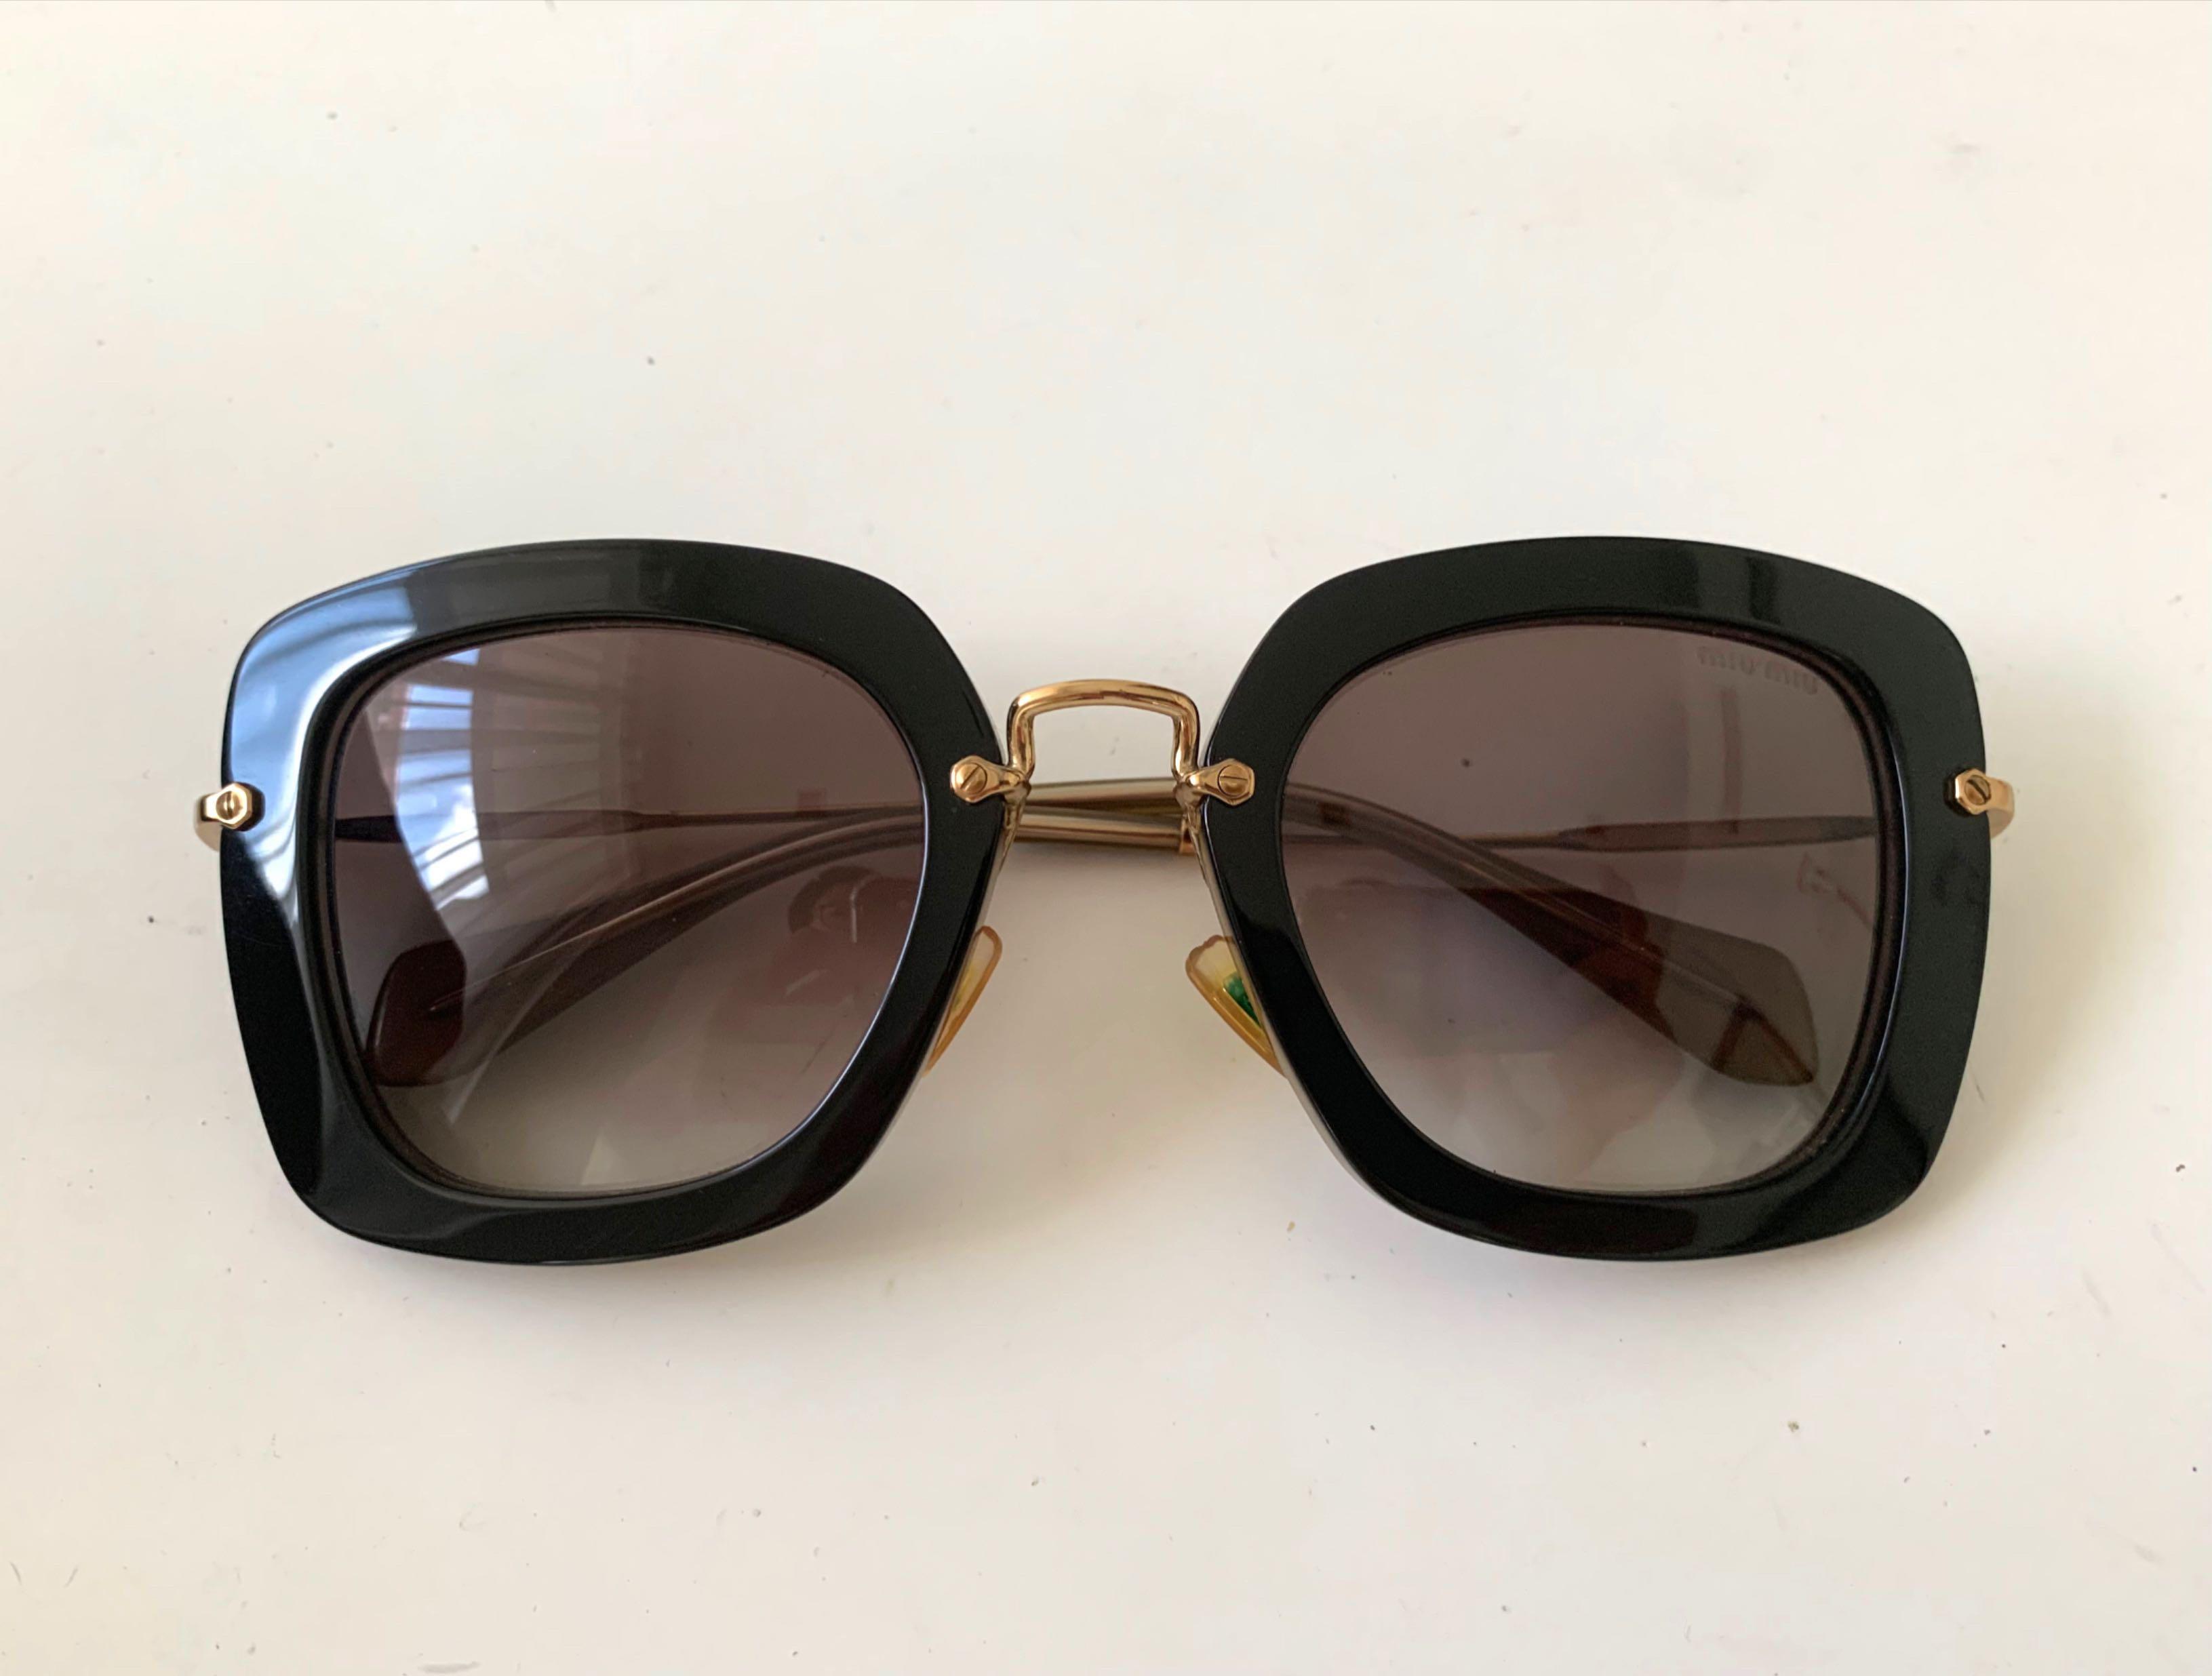 a4db4ebabe8d Miu Miu sunglasses